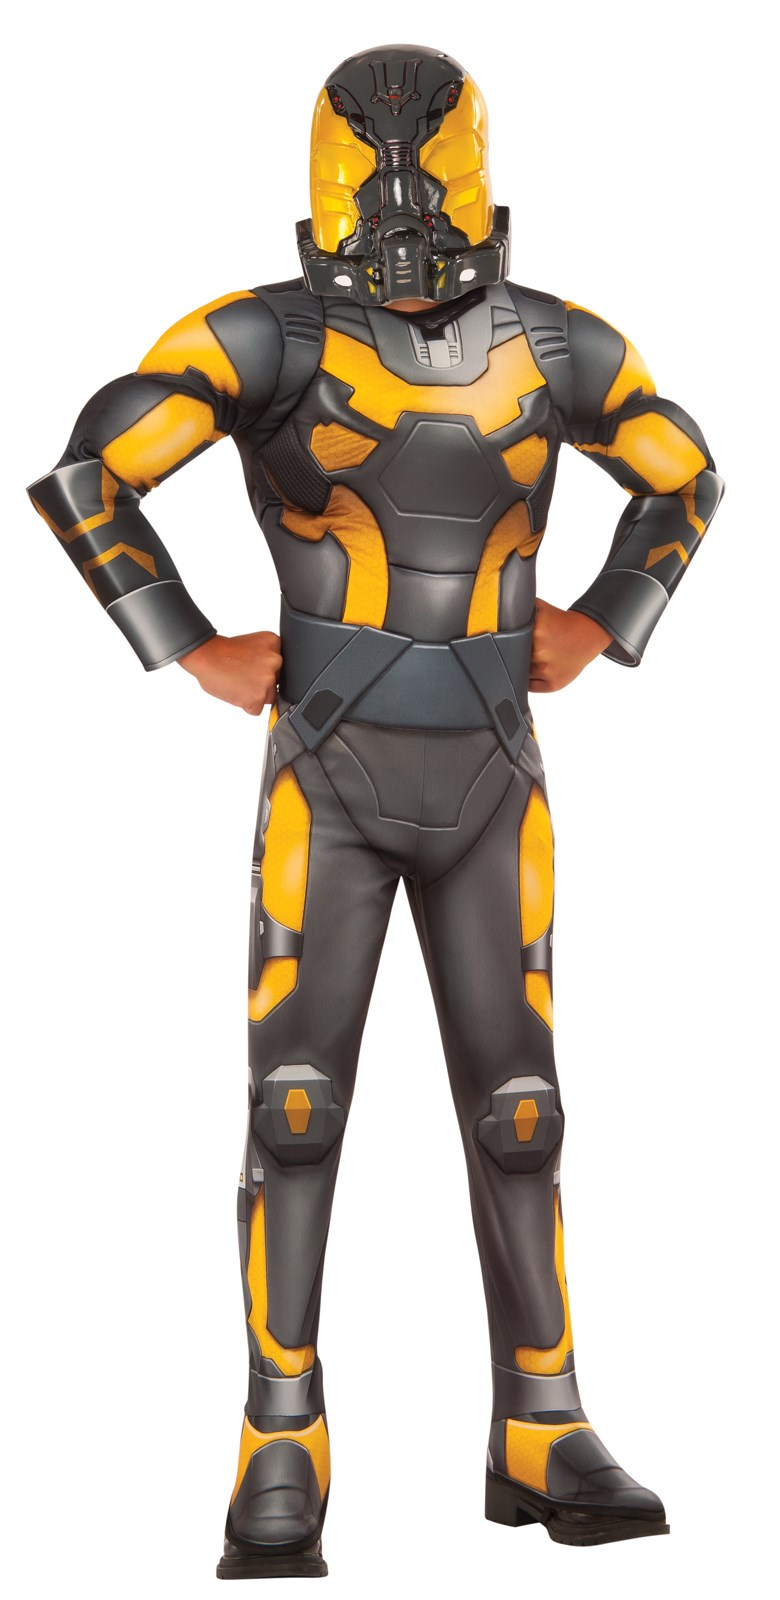 Yellow jacket - Kids Ant Man Yellow Jacket Deluxe Costume